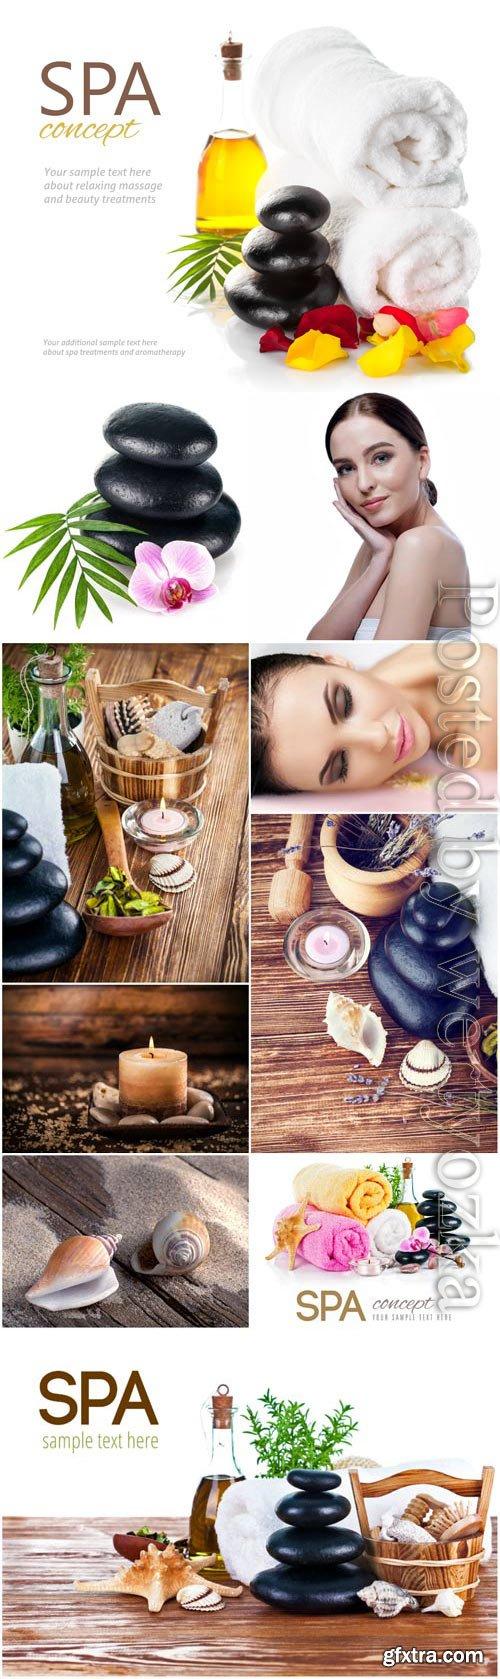 Spa concept, girl in spa salon stock photo